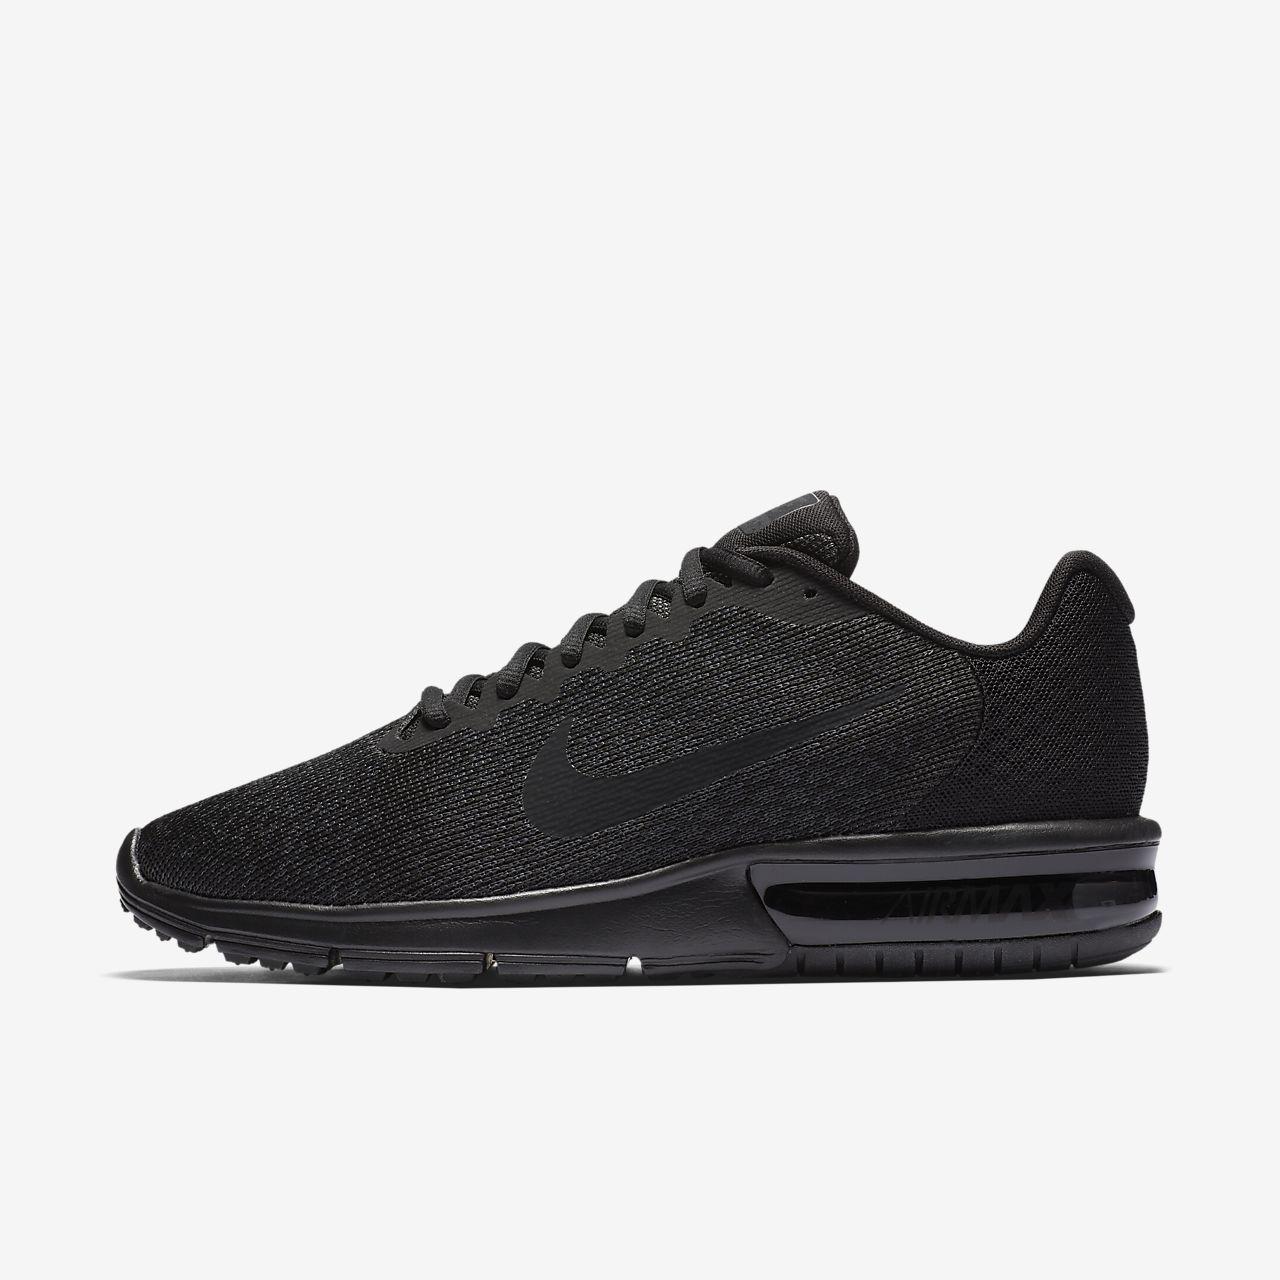 ad96319b5ff96 Chaussure Nike Air Max Sequent 2 pour Homme. Nike.com CH